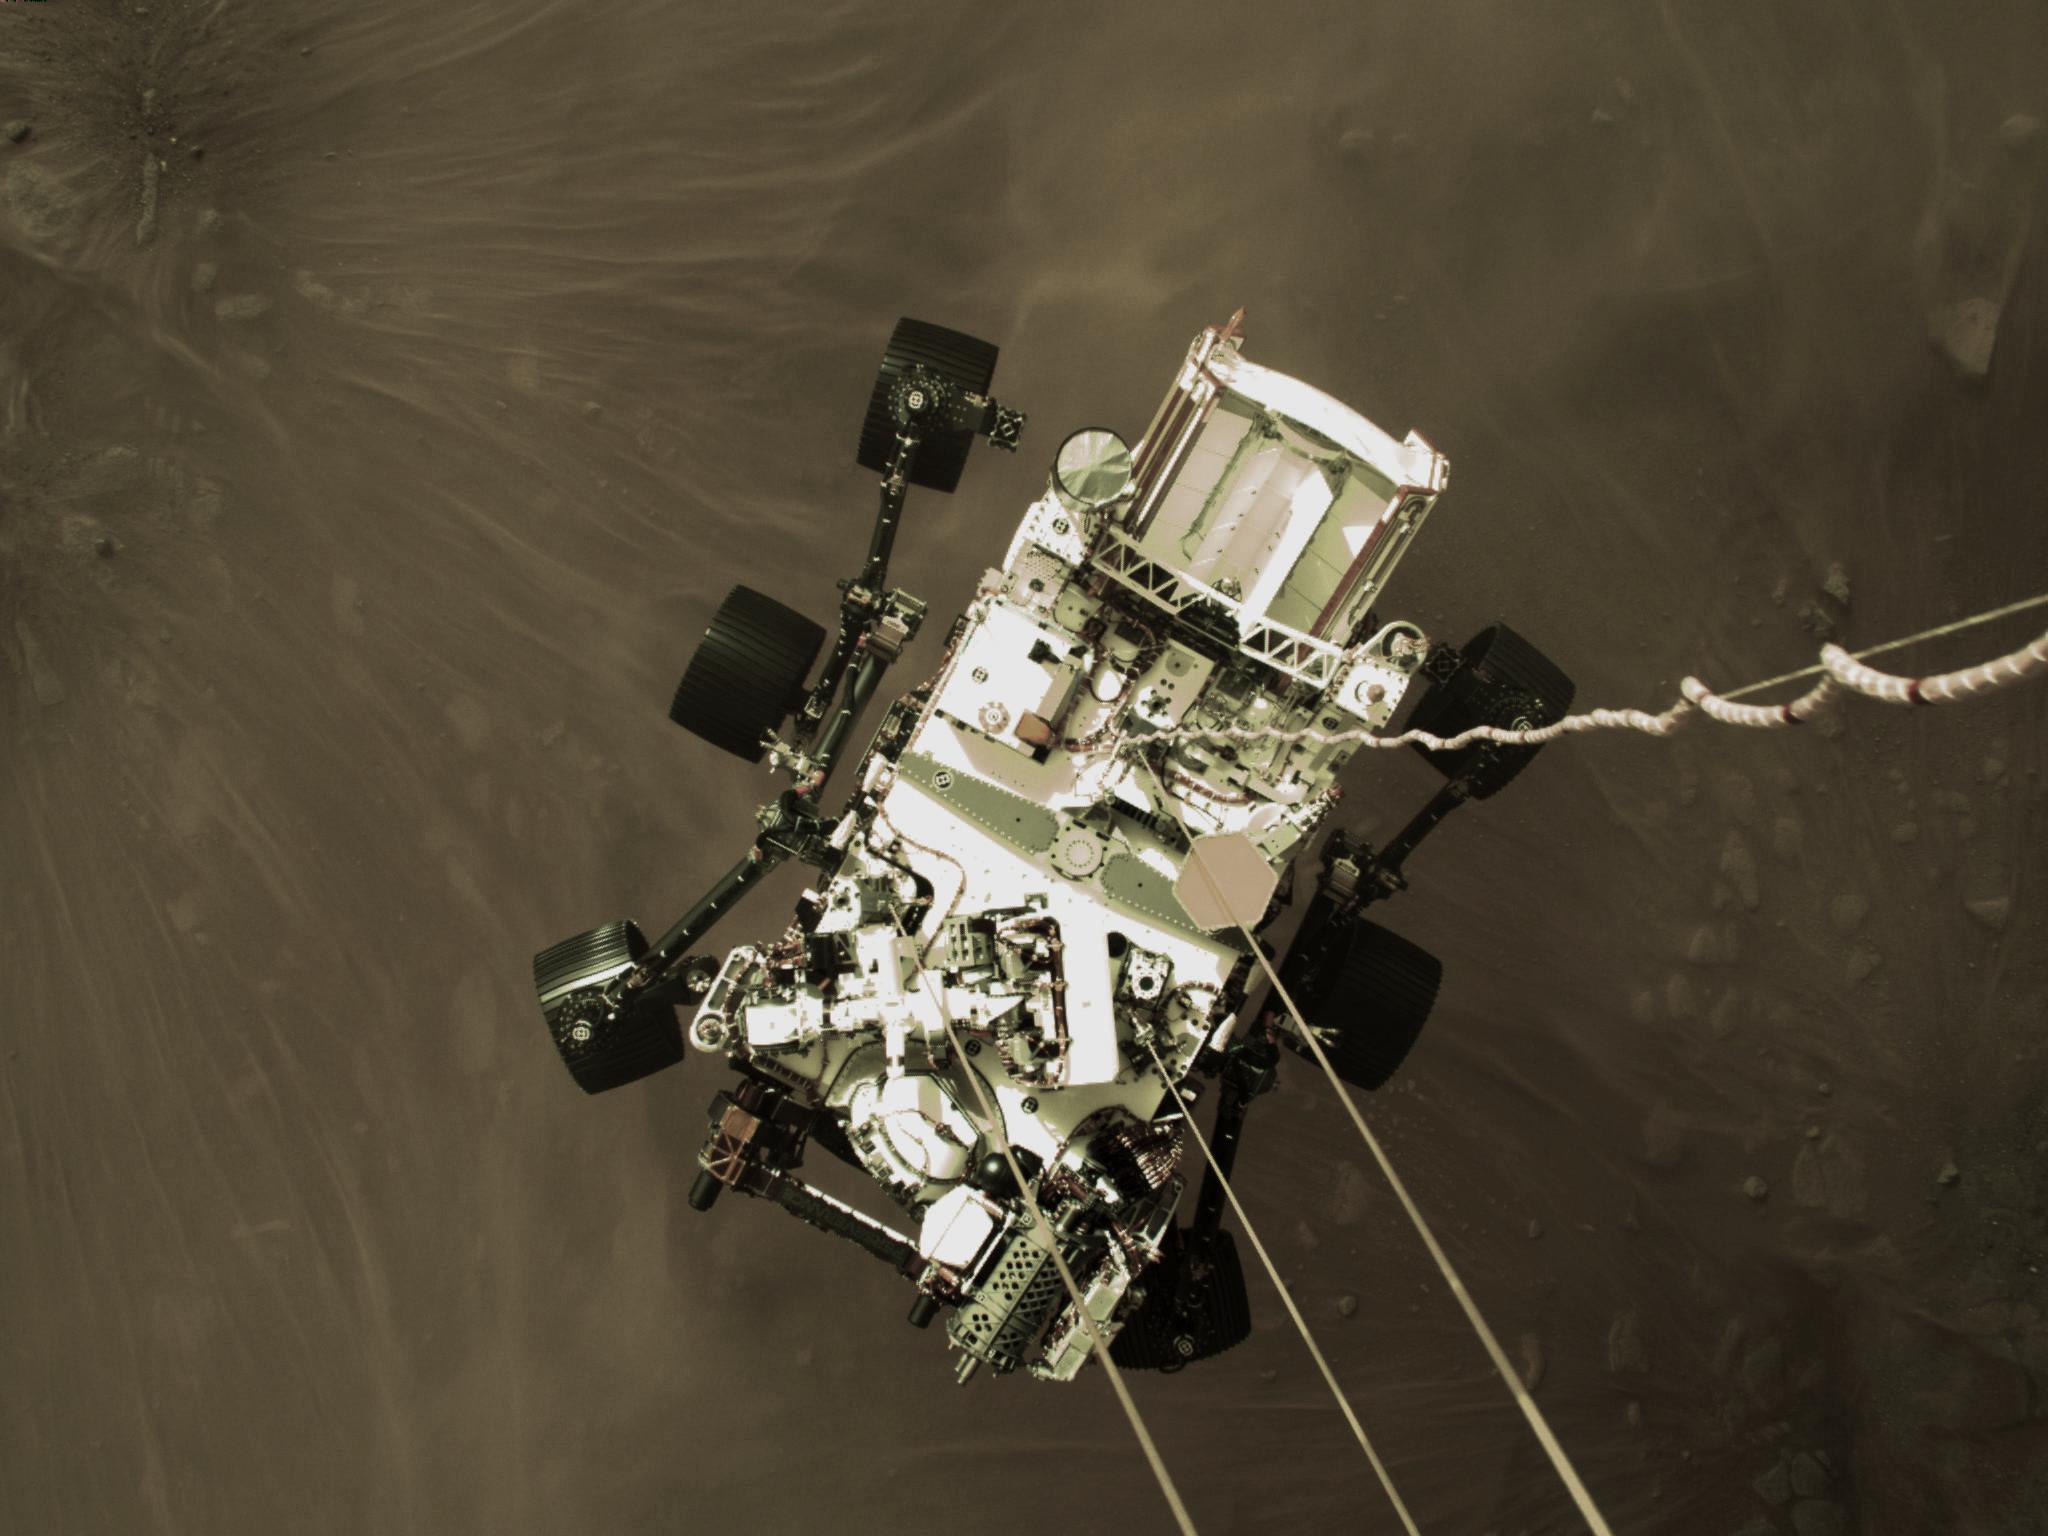 rover_drop.jpg